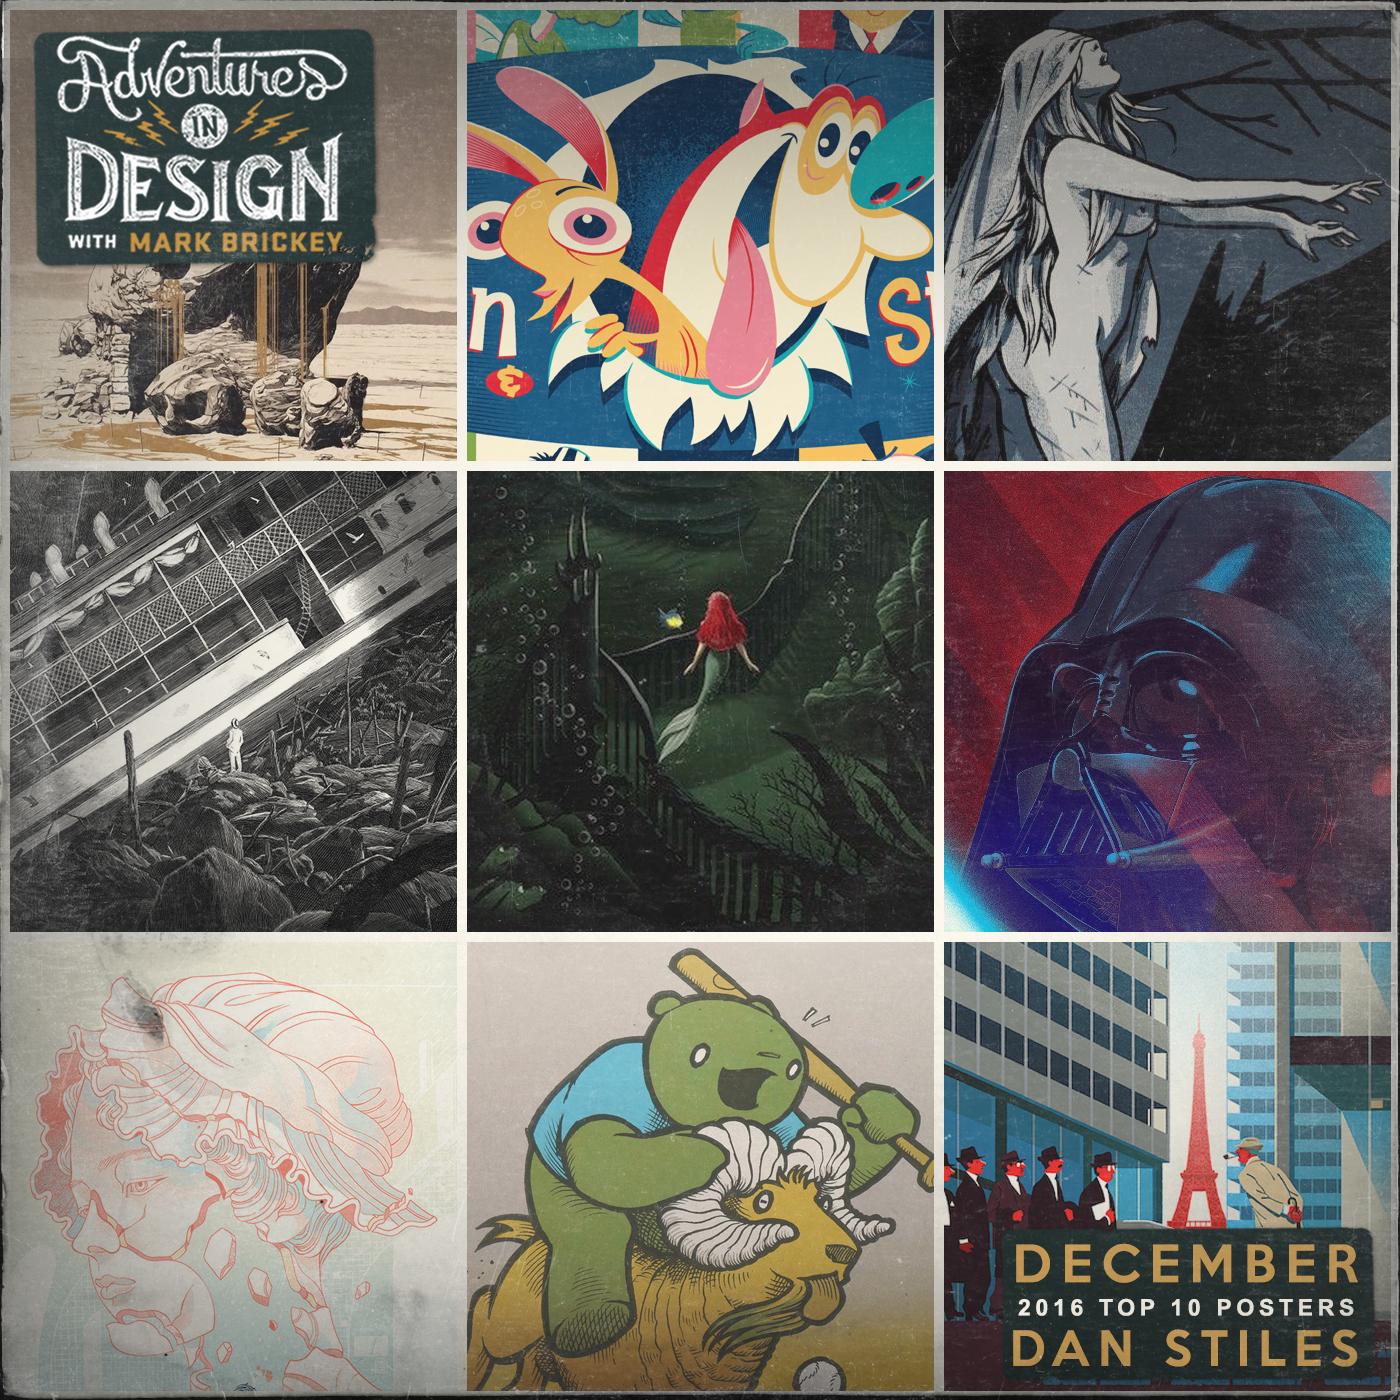 512 - December Poster Countdown with Dan Stiles